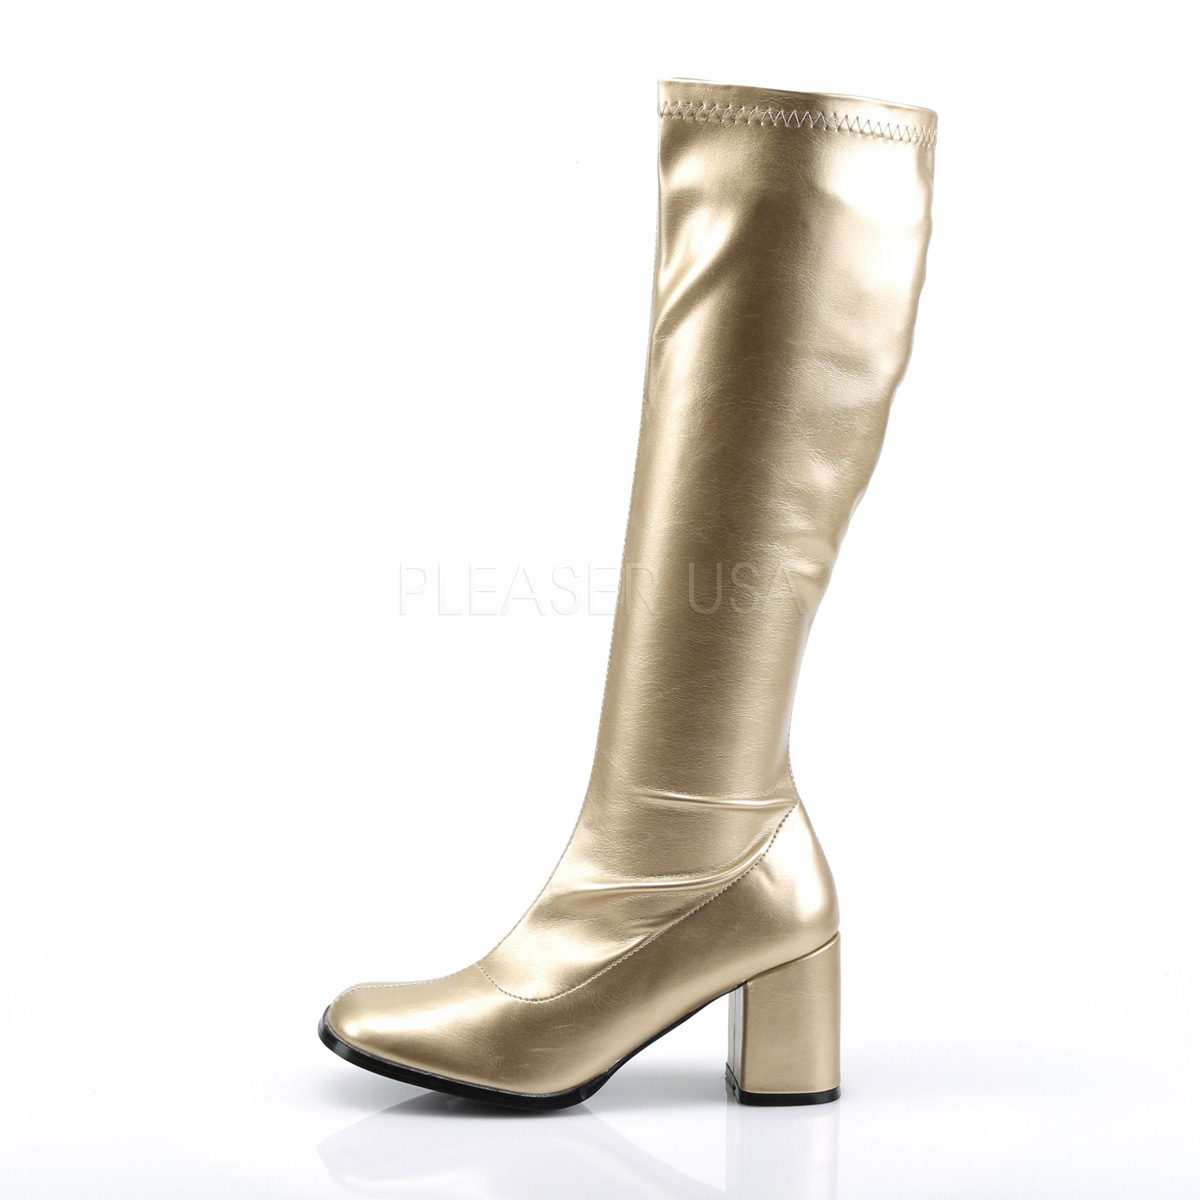 FUNTASMA(Pleaser) GOGO-300 ゴールド/金色 ニーハイブーツ GOGOブーツ コスプレ用ブーツ イベント 衣装  仮装 ハロウィン◆取り寄せ